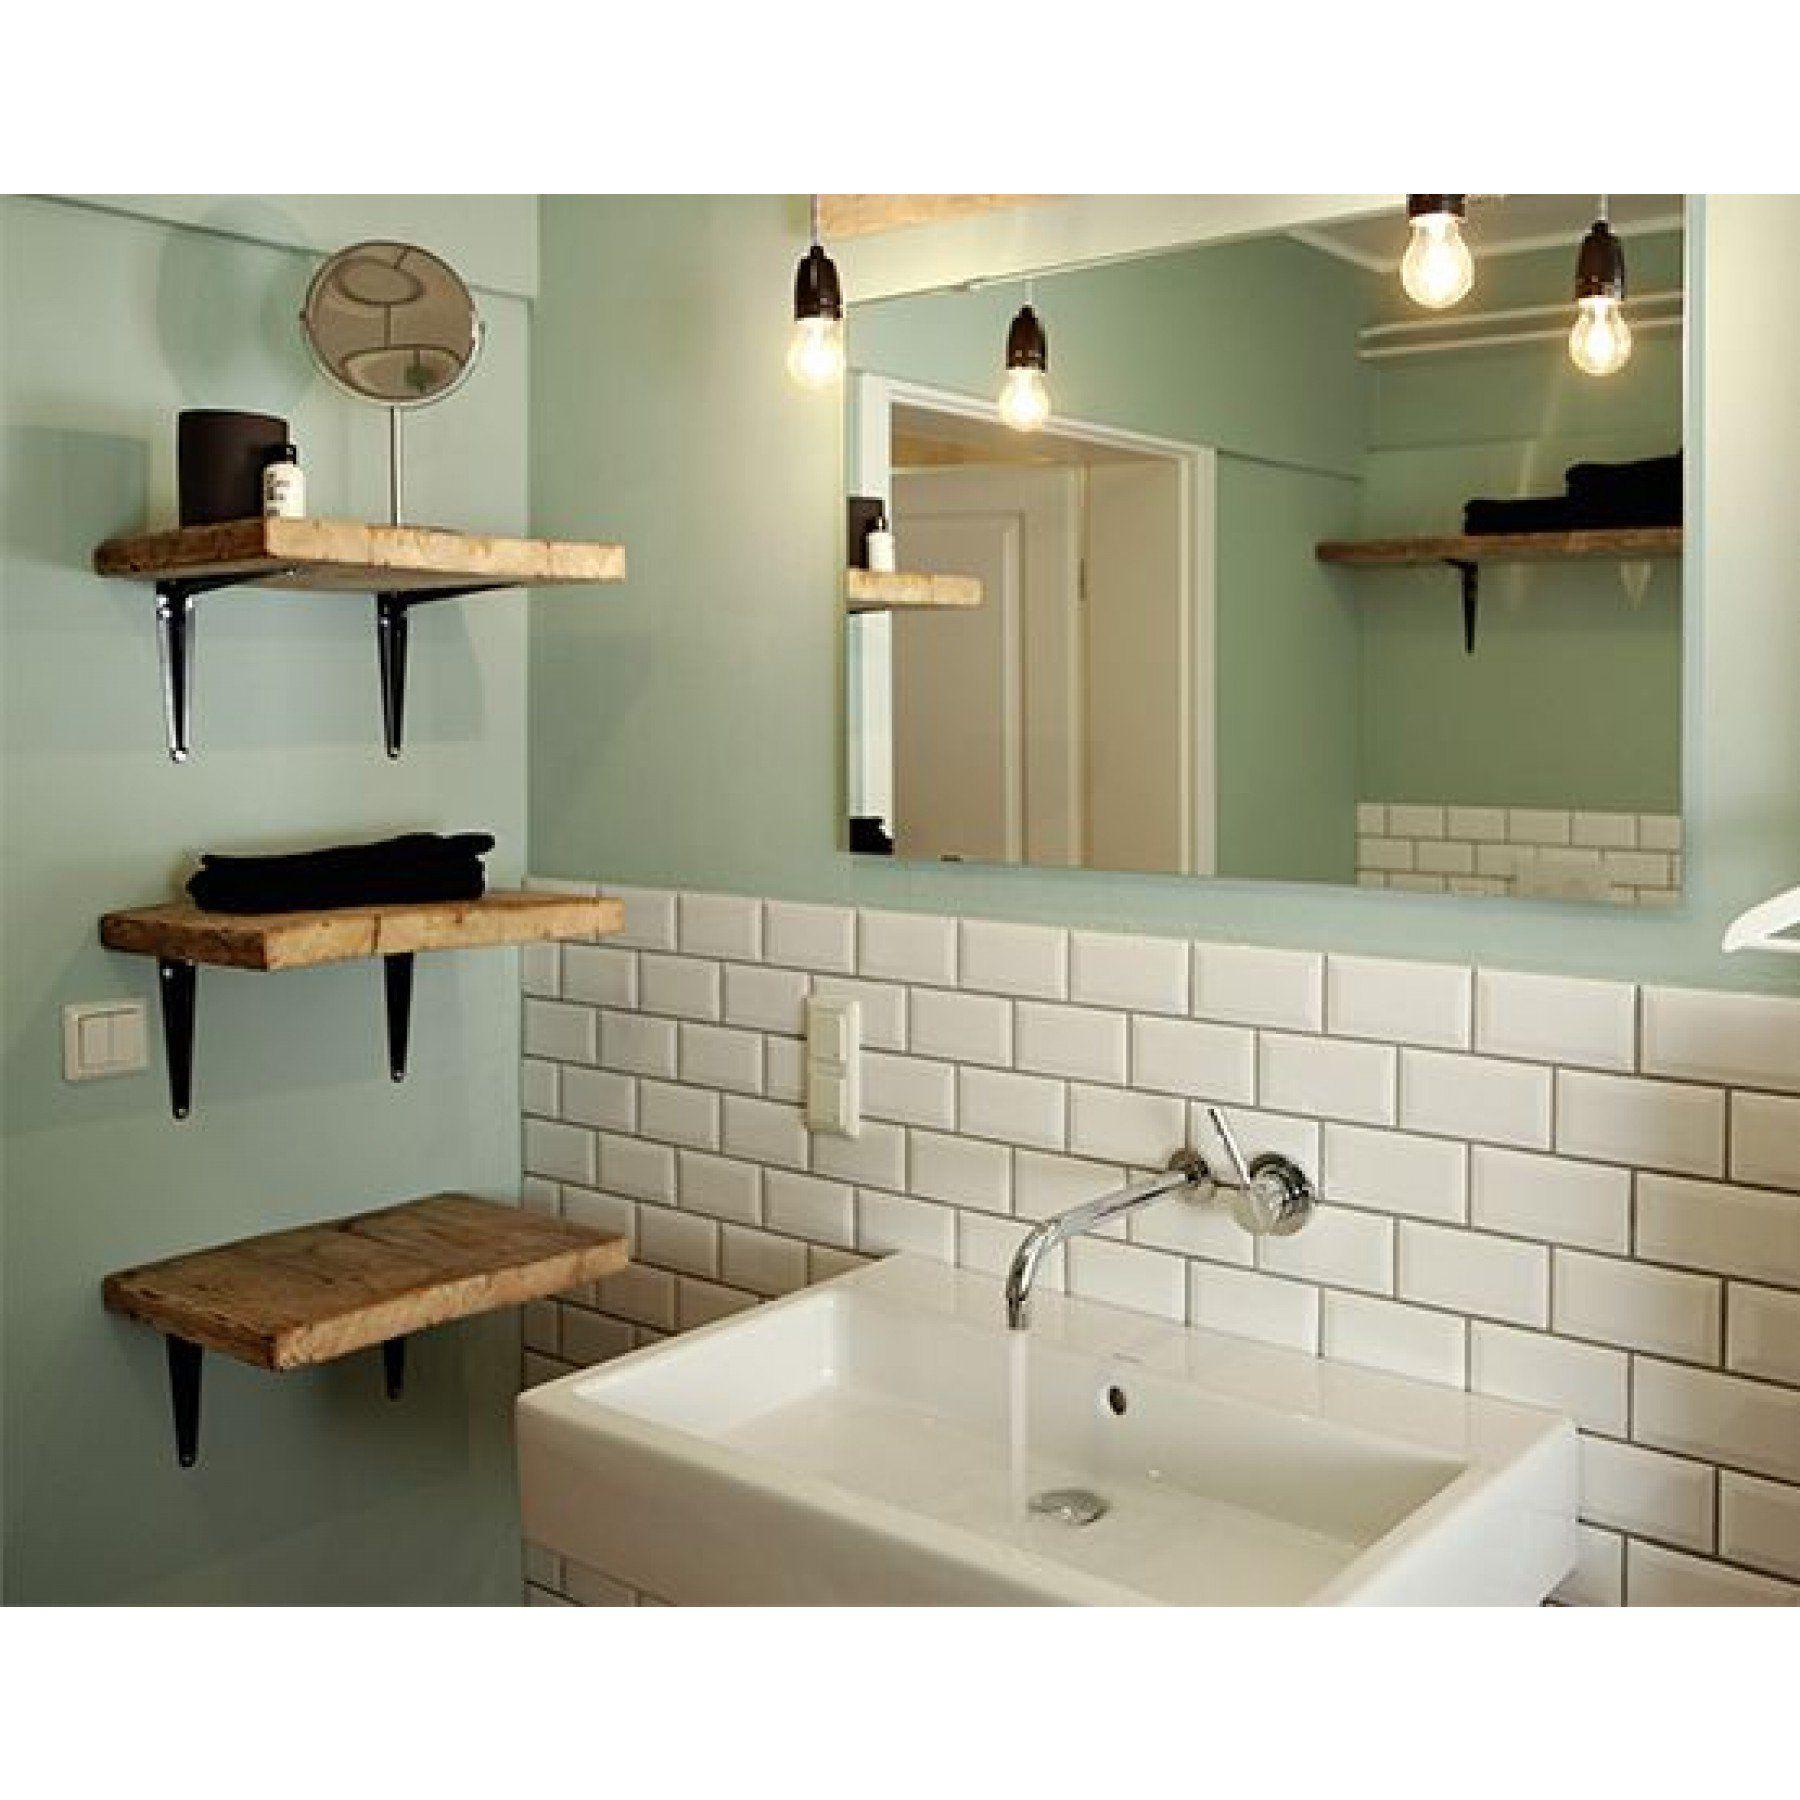 Photo of Tile world wall tile Collexion Metro tiles white high gloss 10x20cm buy now cheap!